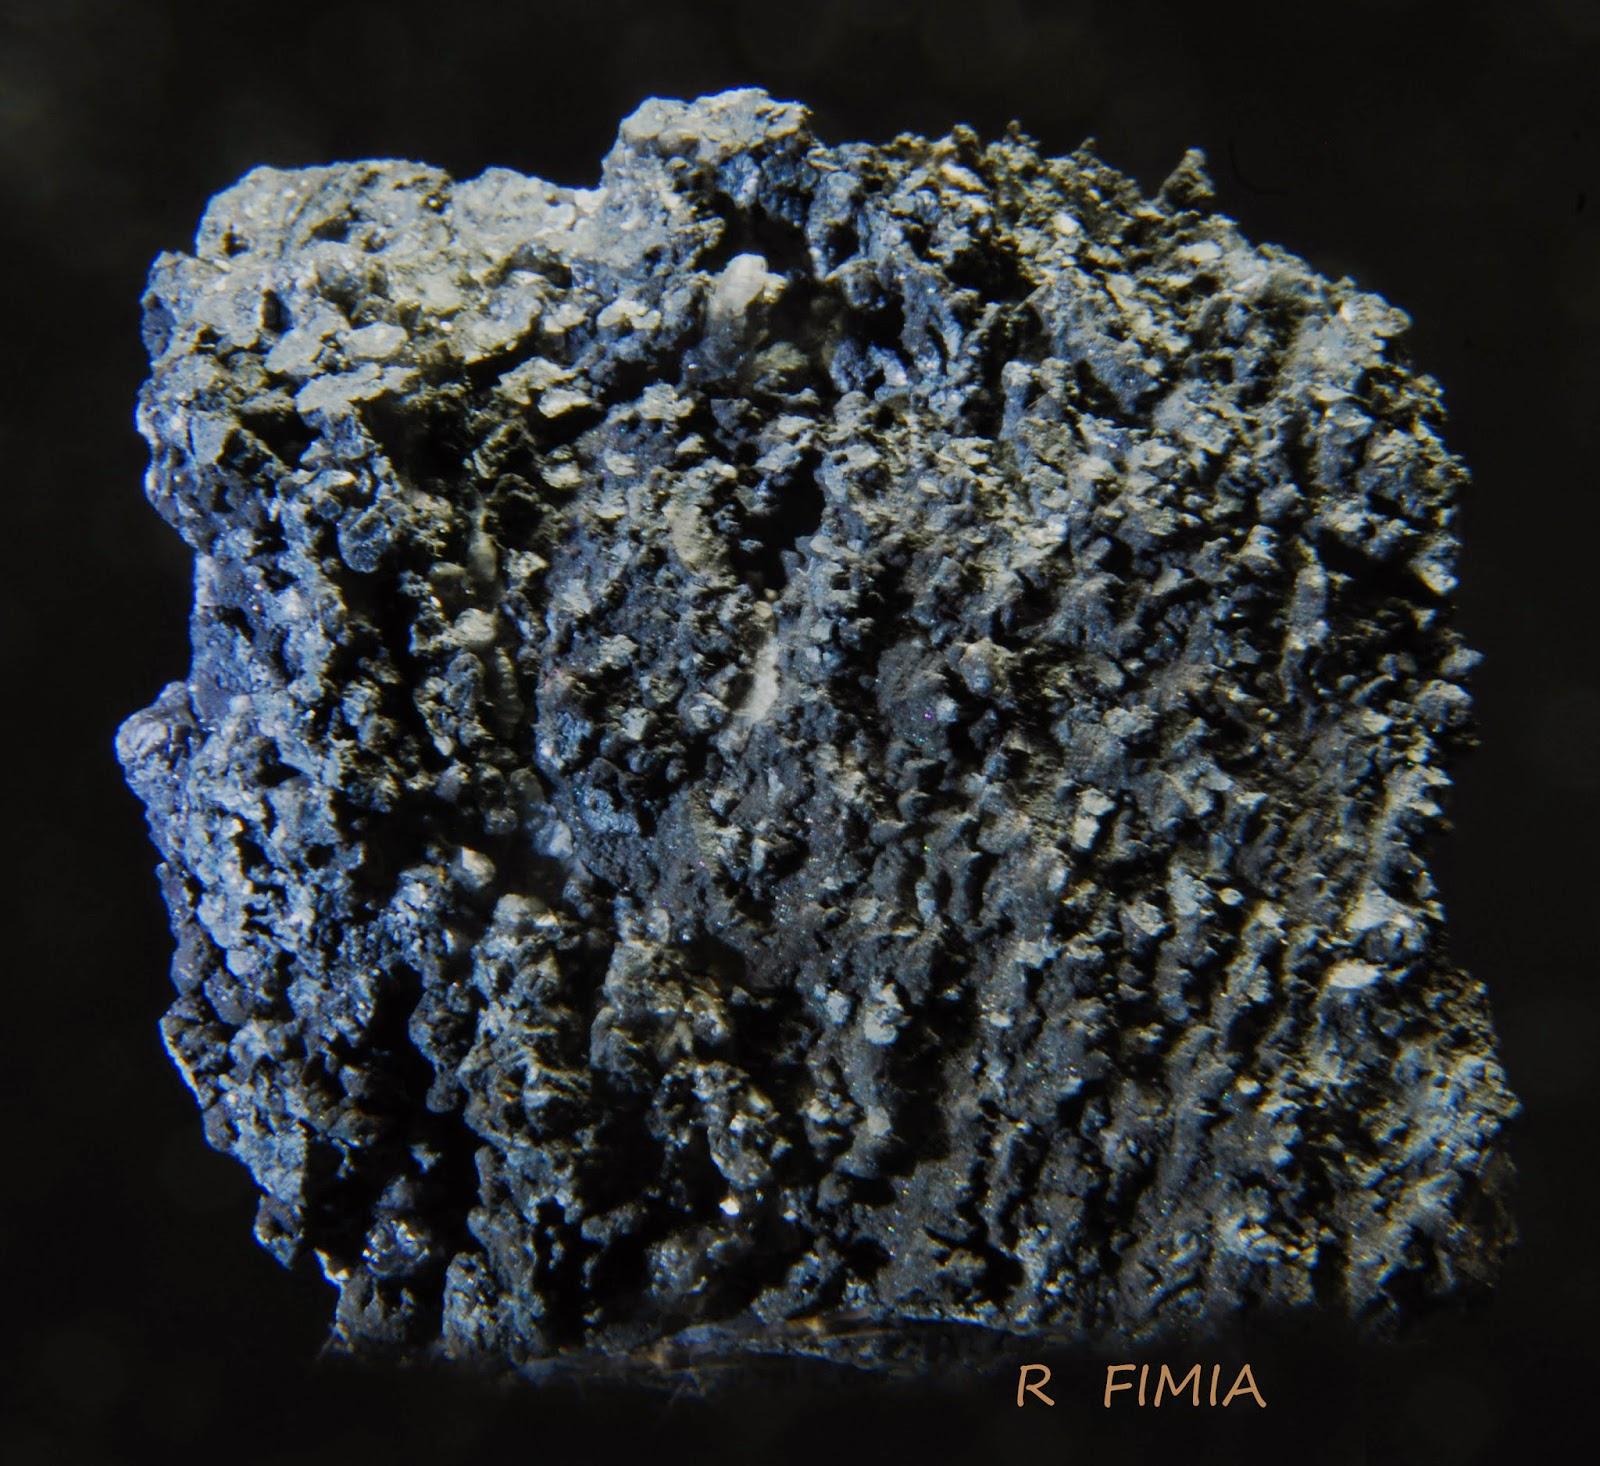 colección R. Fimia - Página 9 Coronadita.%2BCantera%2BCarija%2C%2BMerida%2C%2BBadajoz%2B%2C%2BEspa%C3%B1a.